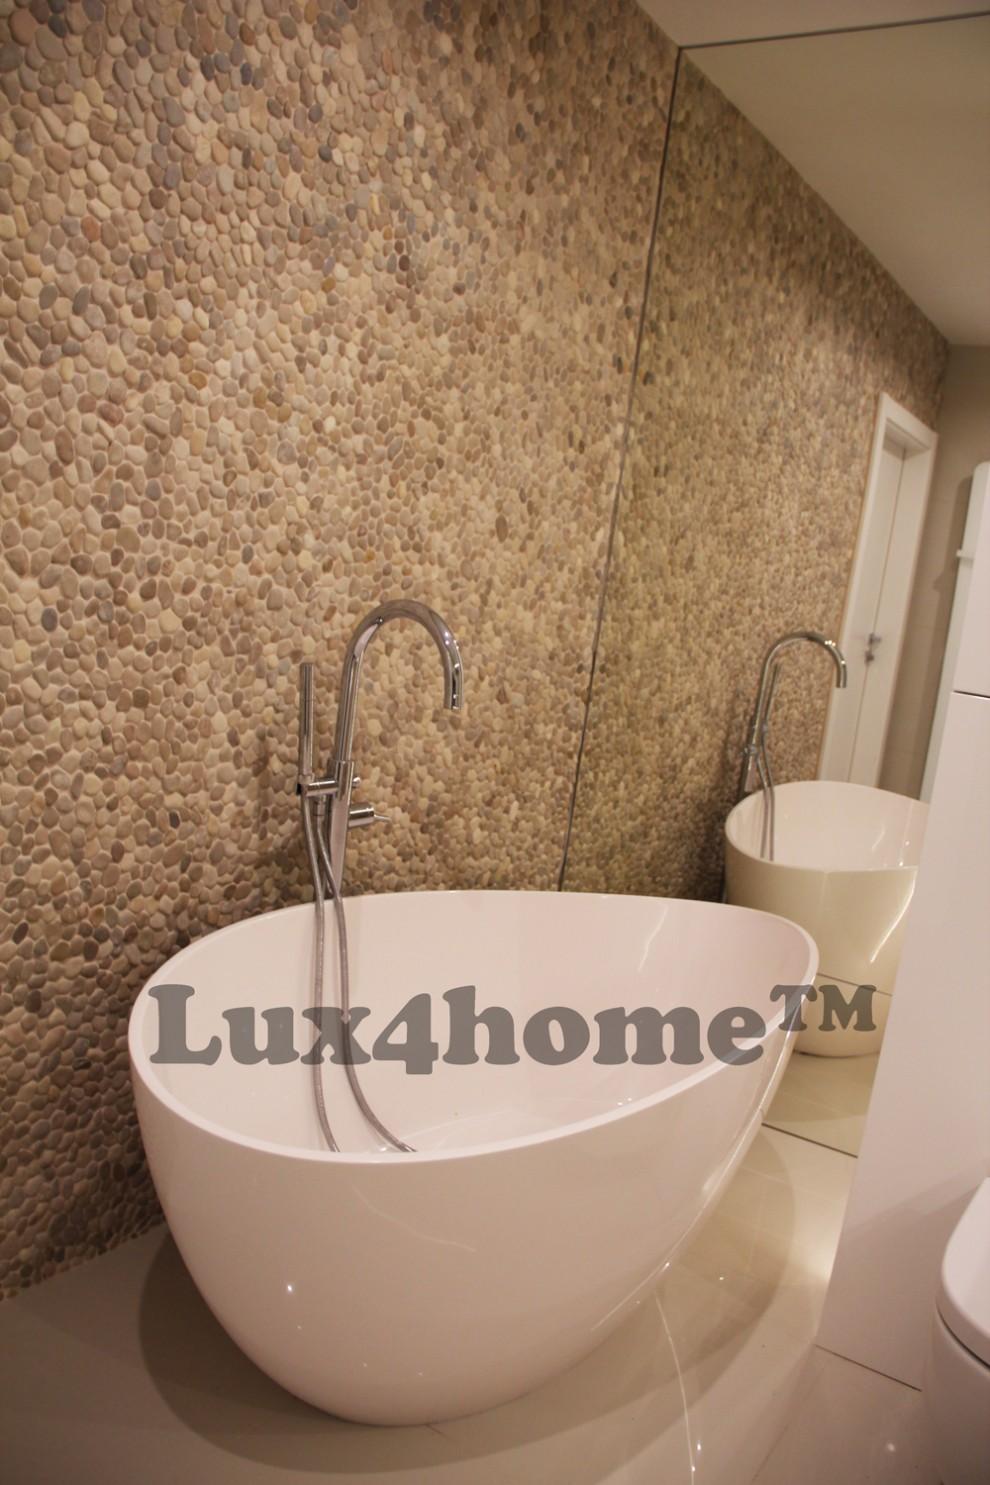 Pebble tiles Maluku Tan-Lux4home(6)